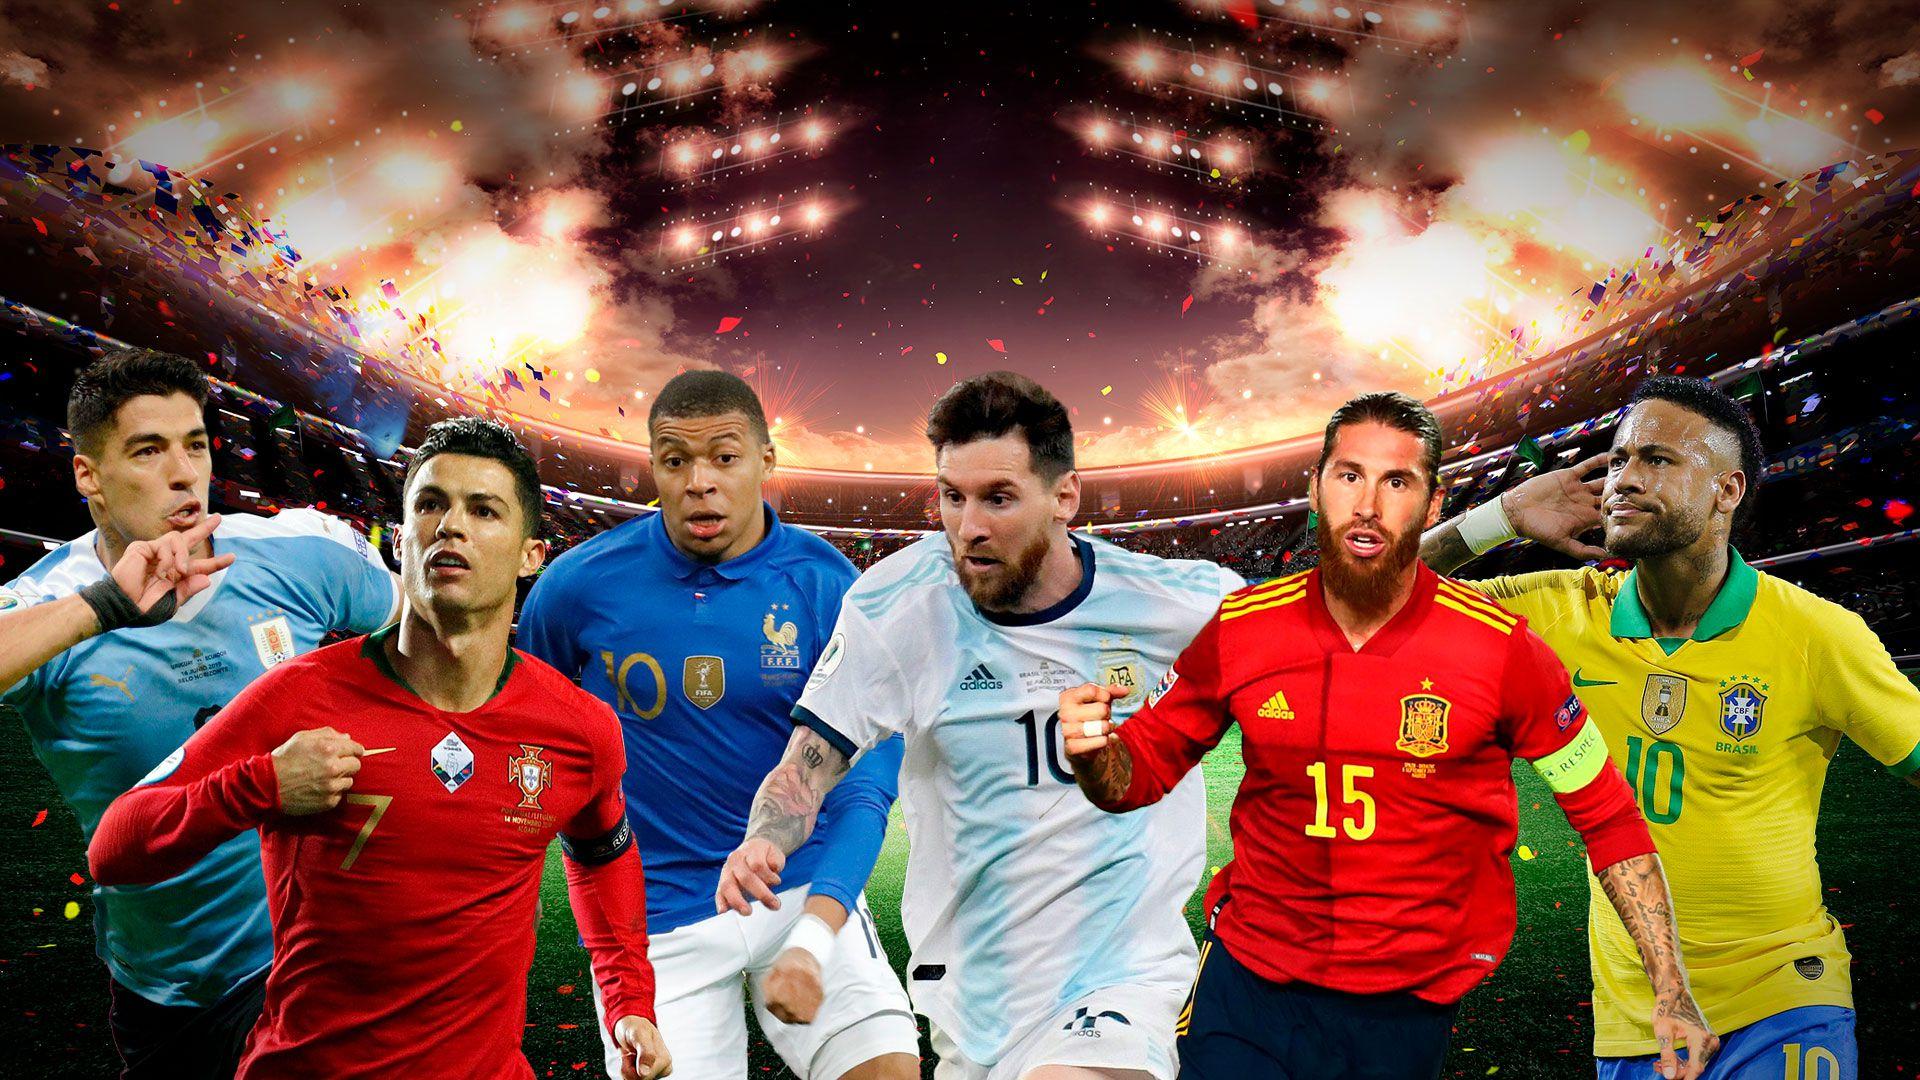 Cristiano Ronaldo, Luis Suárez, Sergio Ramos, Lionel Messi, Neymar y Mbappe